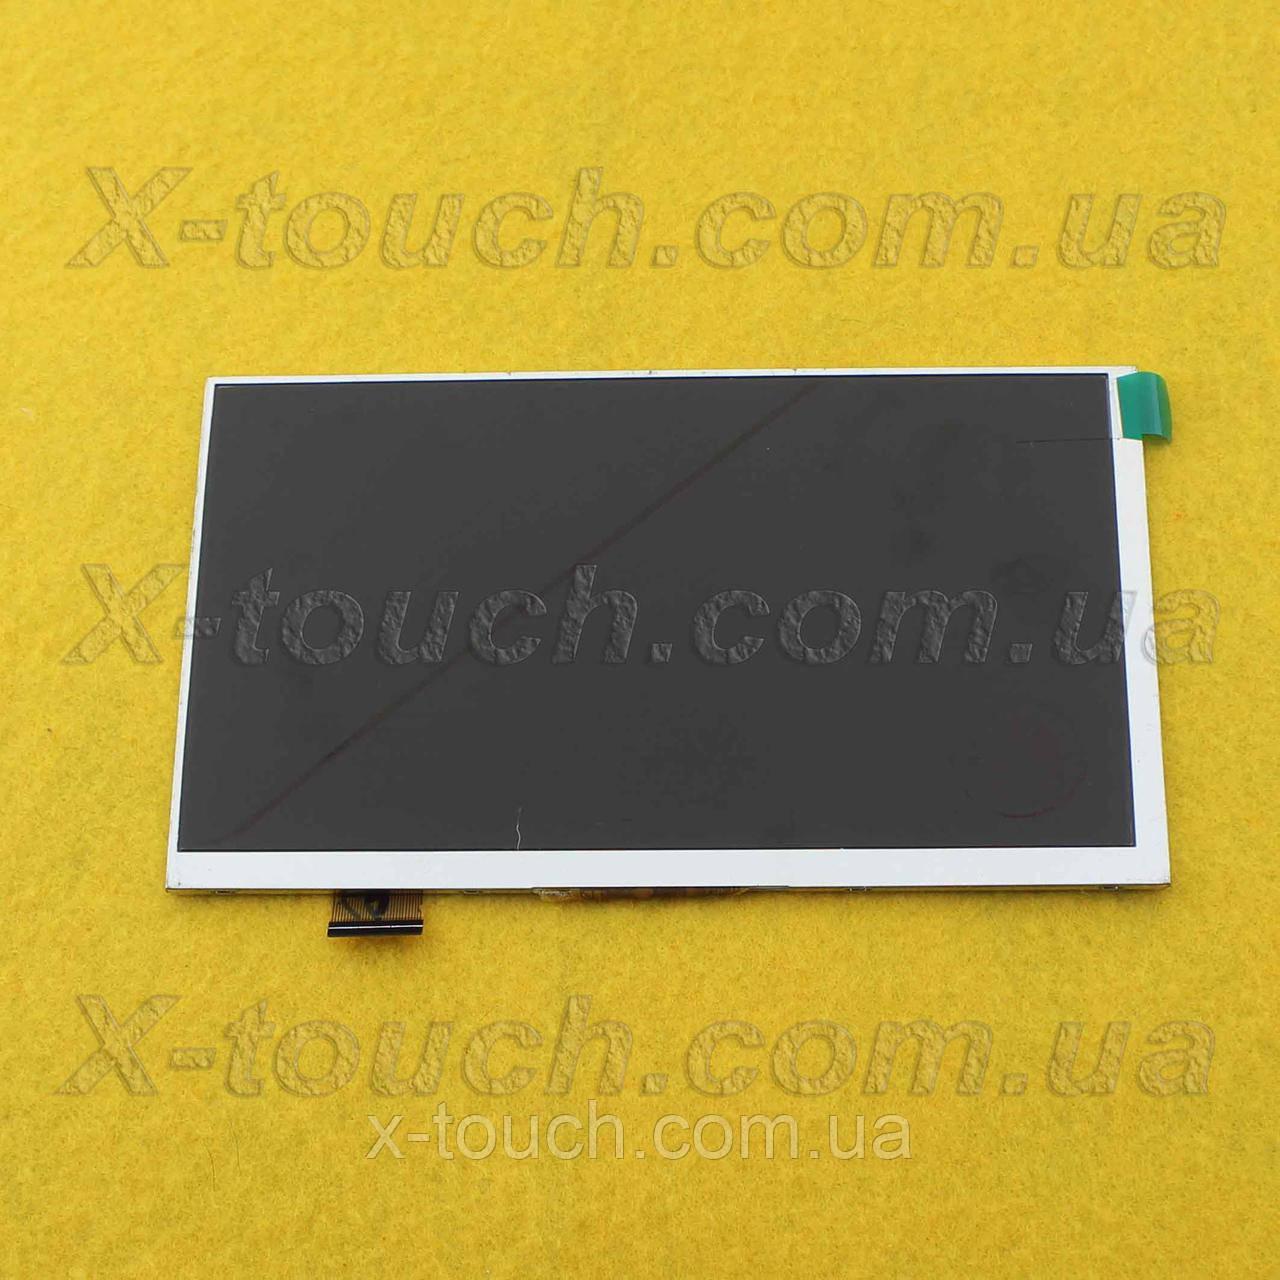 Матриця,екран, дисплей Oysters T72 3G для планшета